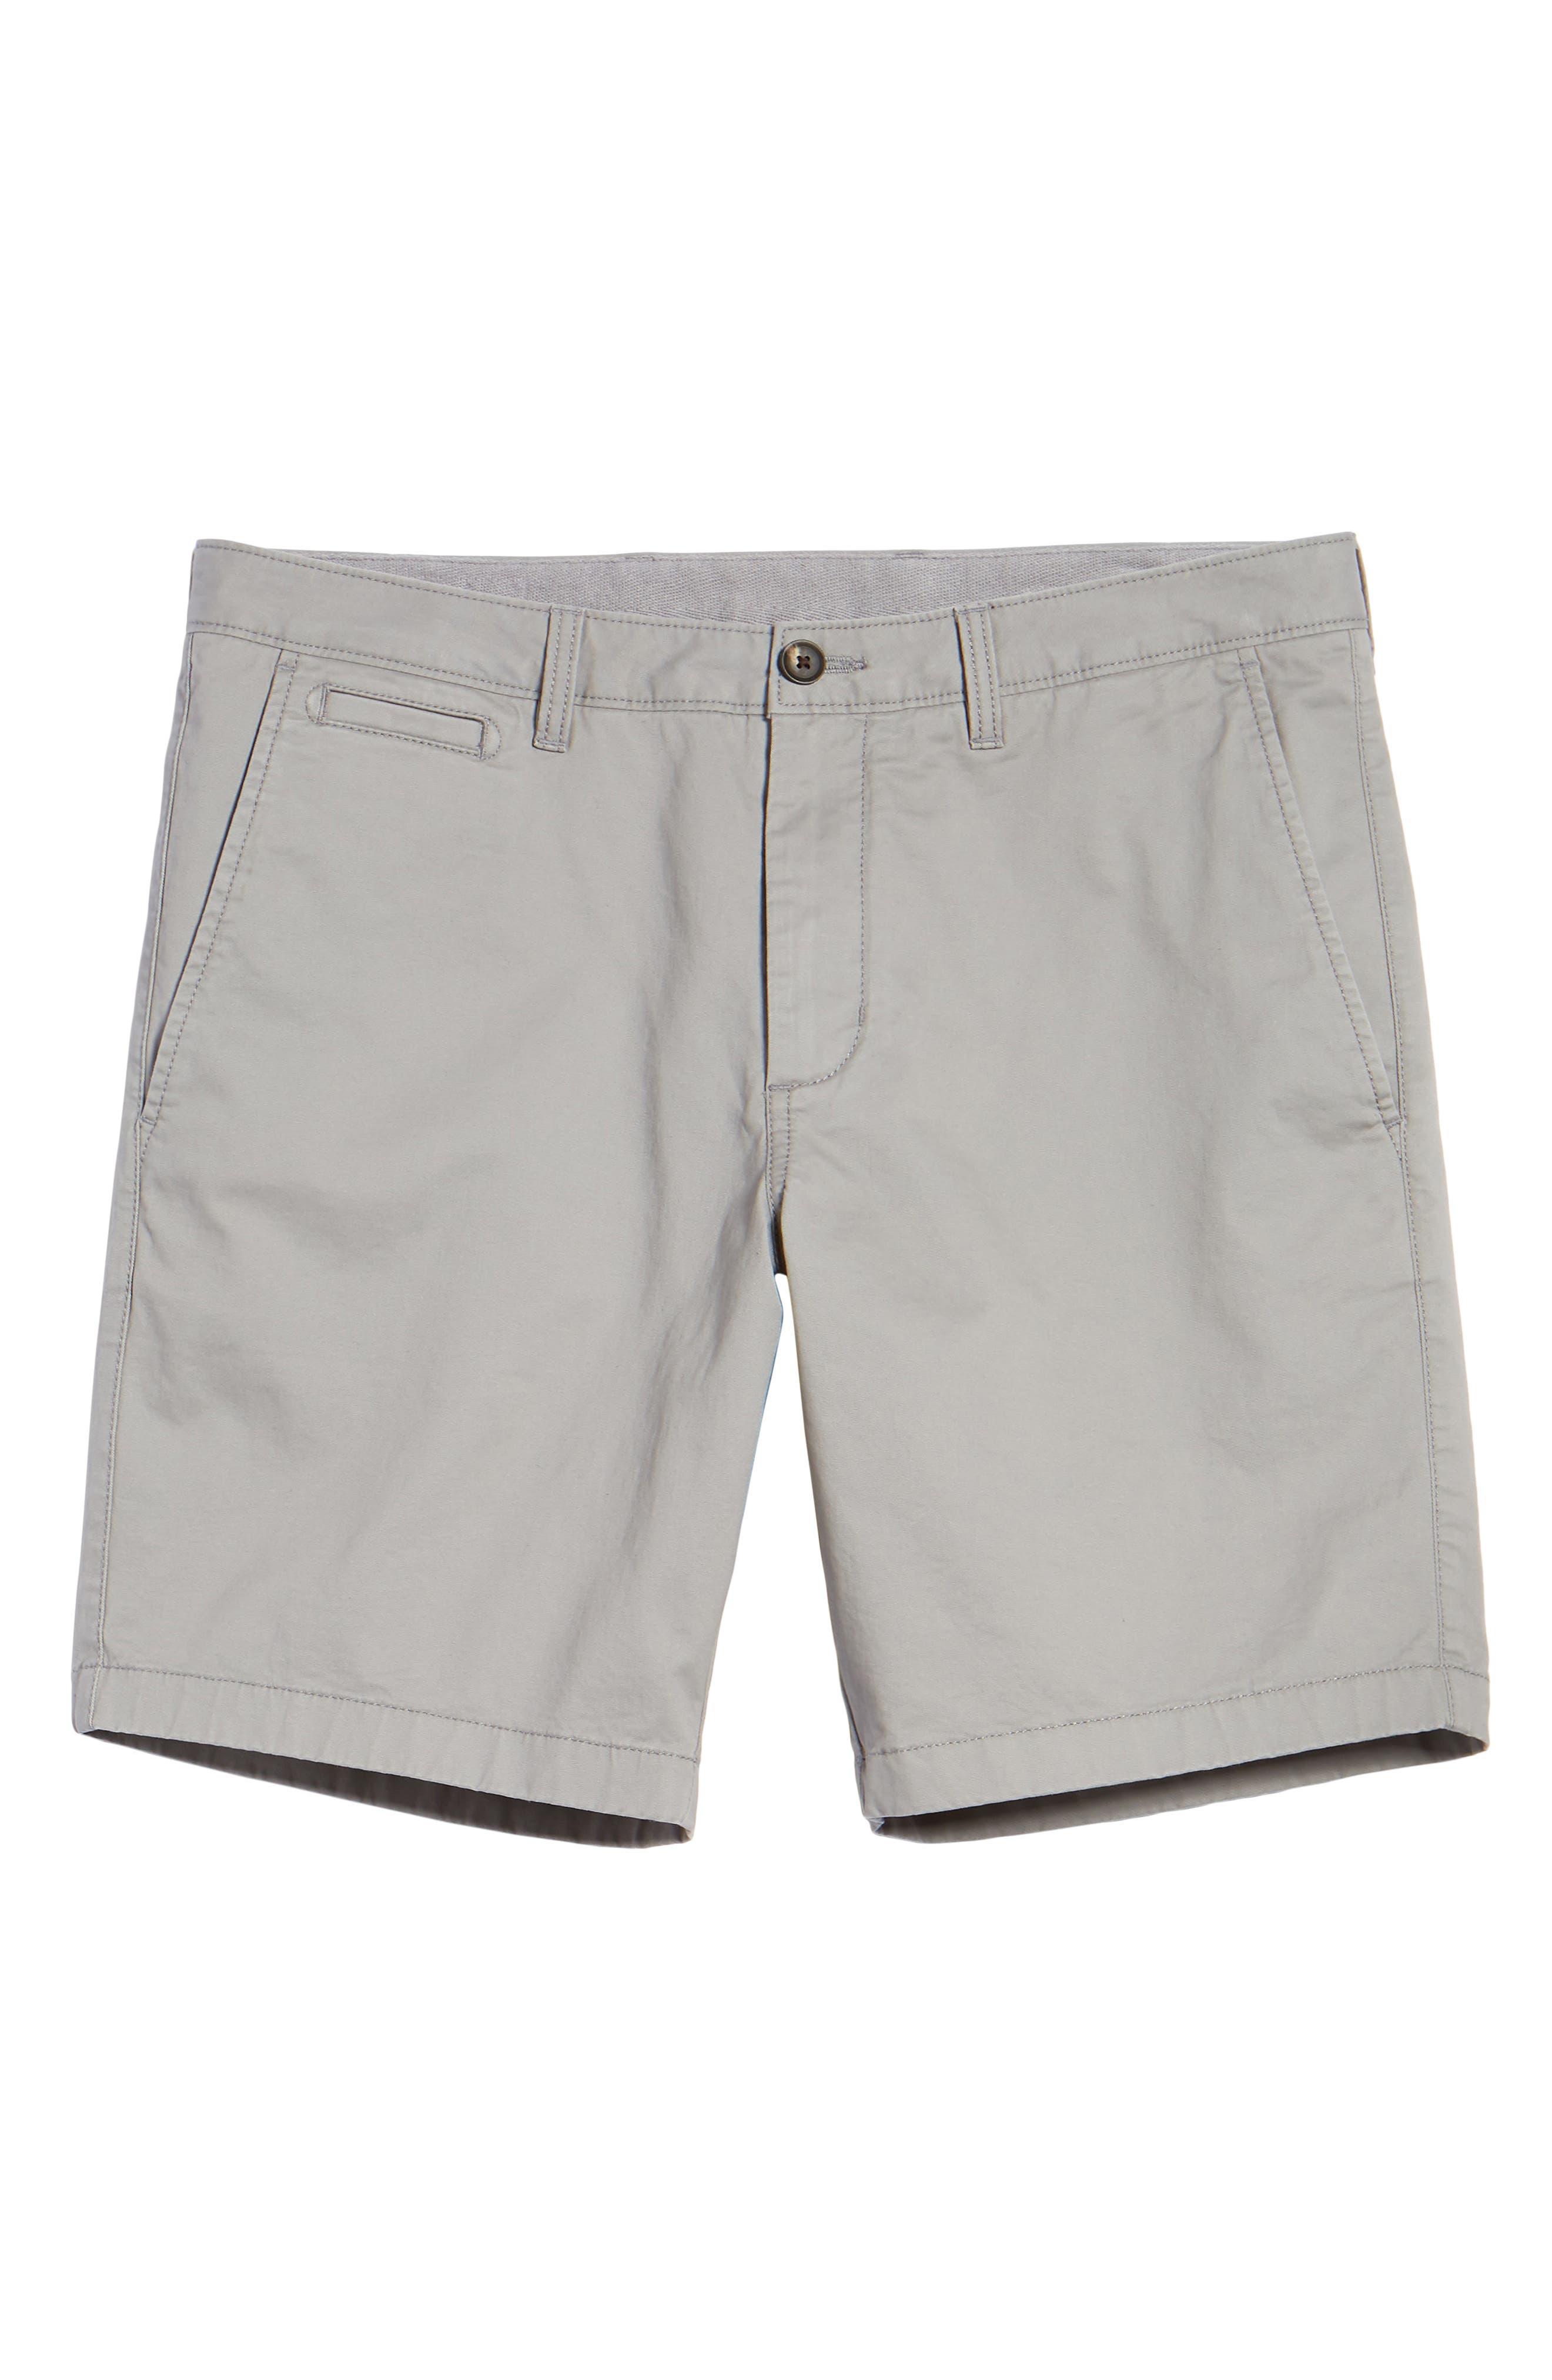 Ballard Slim Fit Stretch Chino 9-Inch Shorts,                             Alternate thumbnail 61, color,